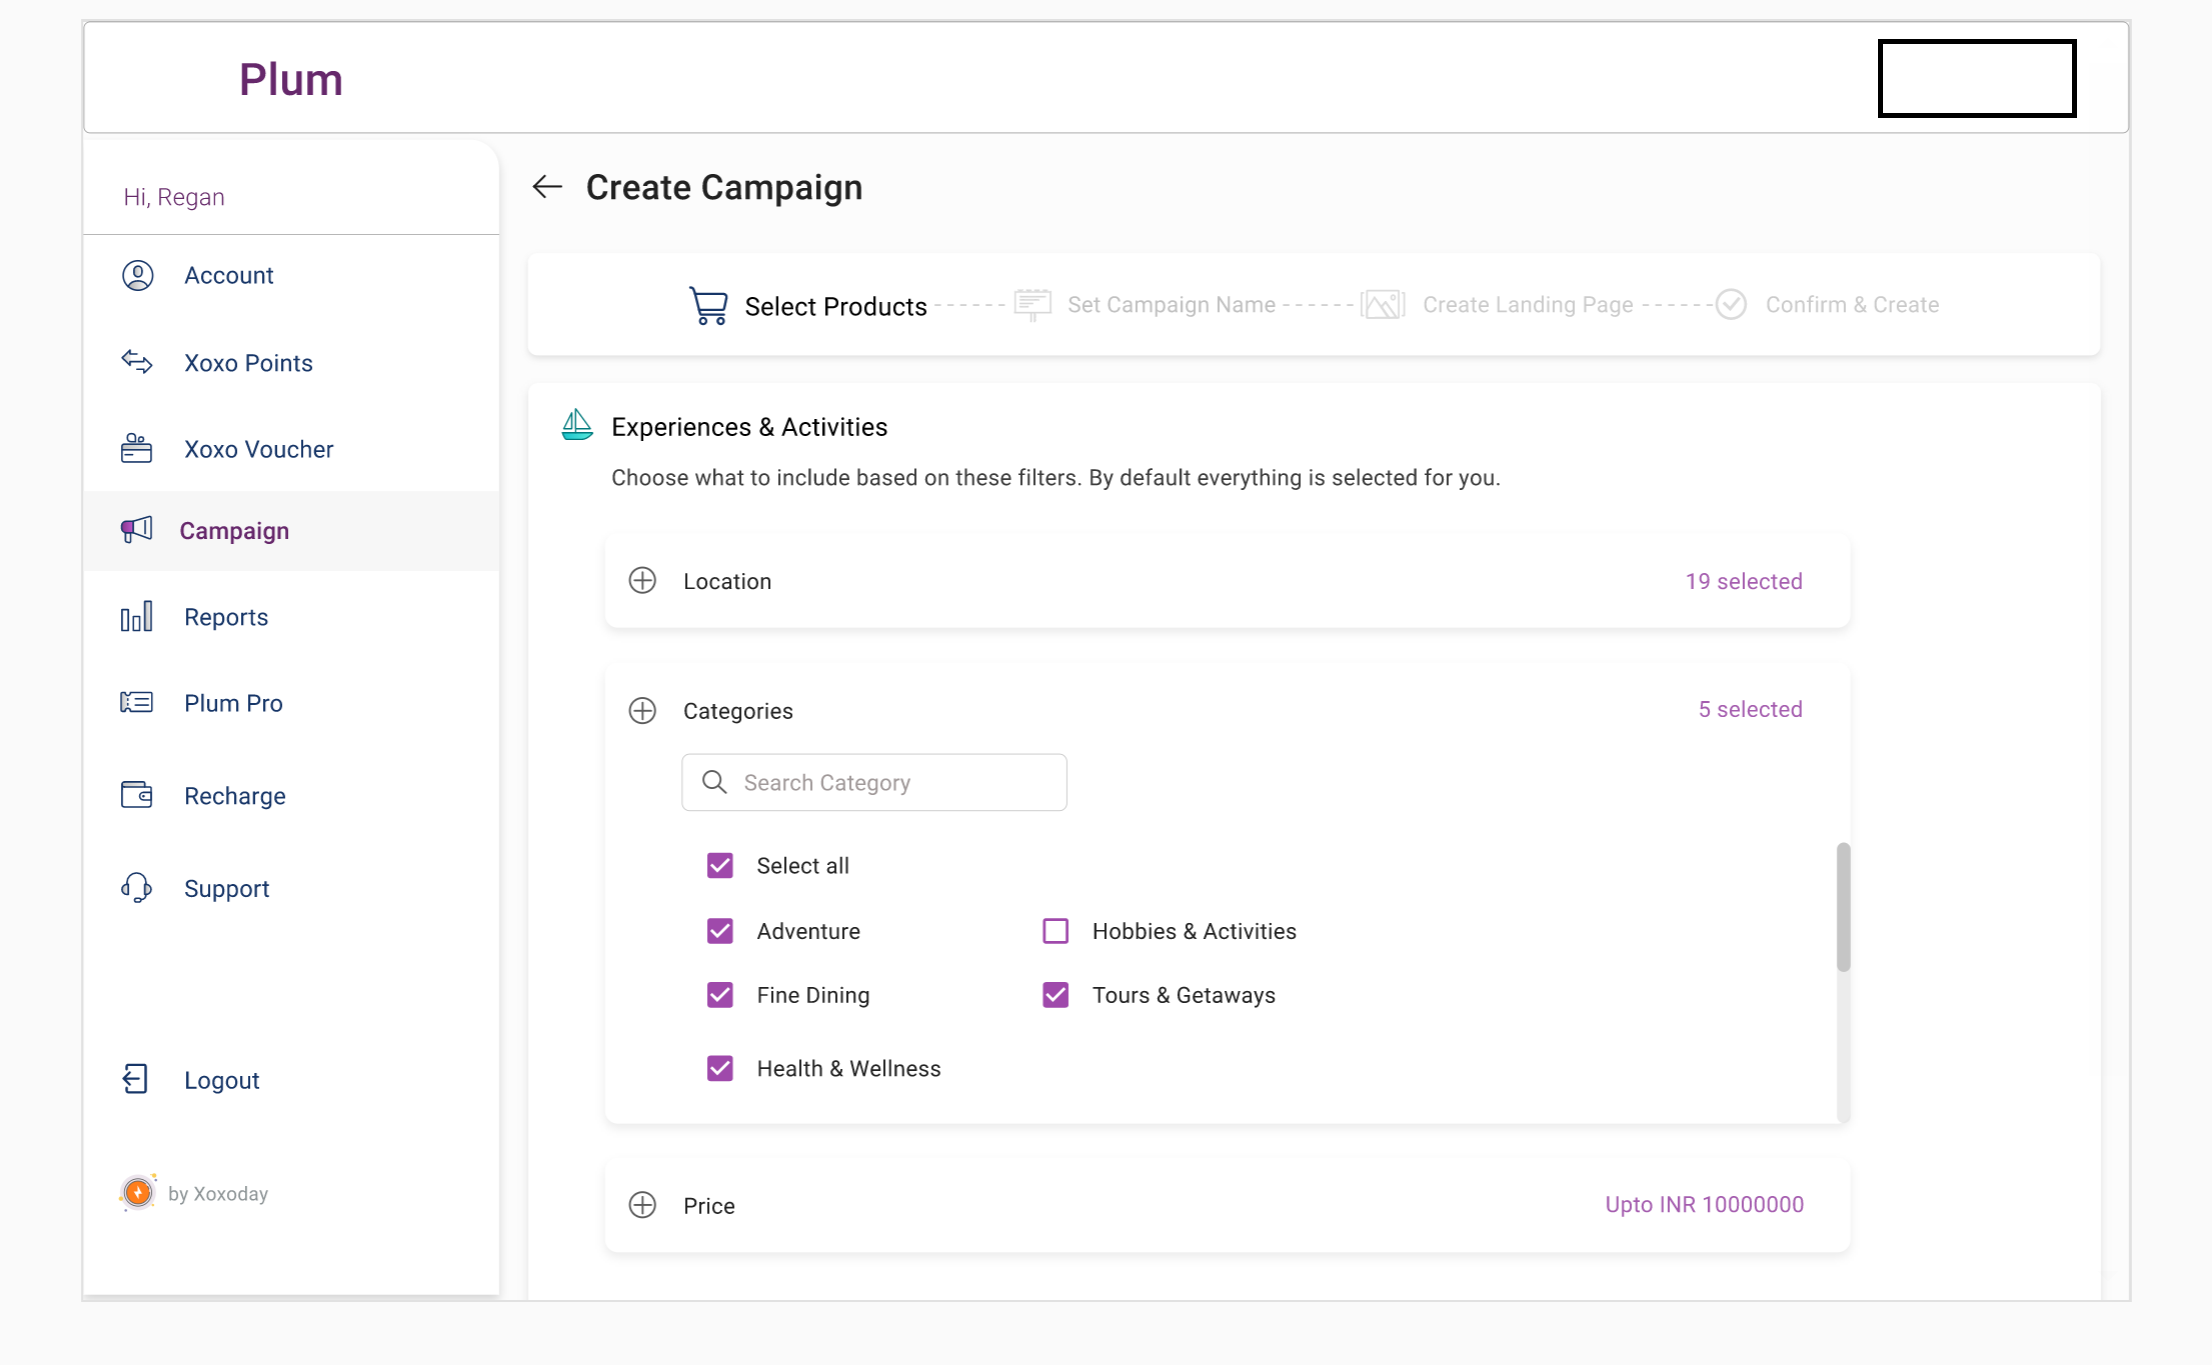 Xoxoday Plum Software - Xoxoday Plum campaigns